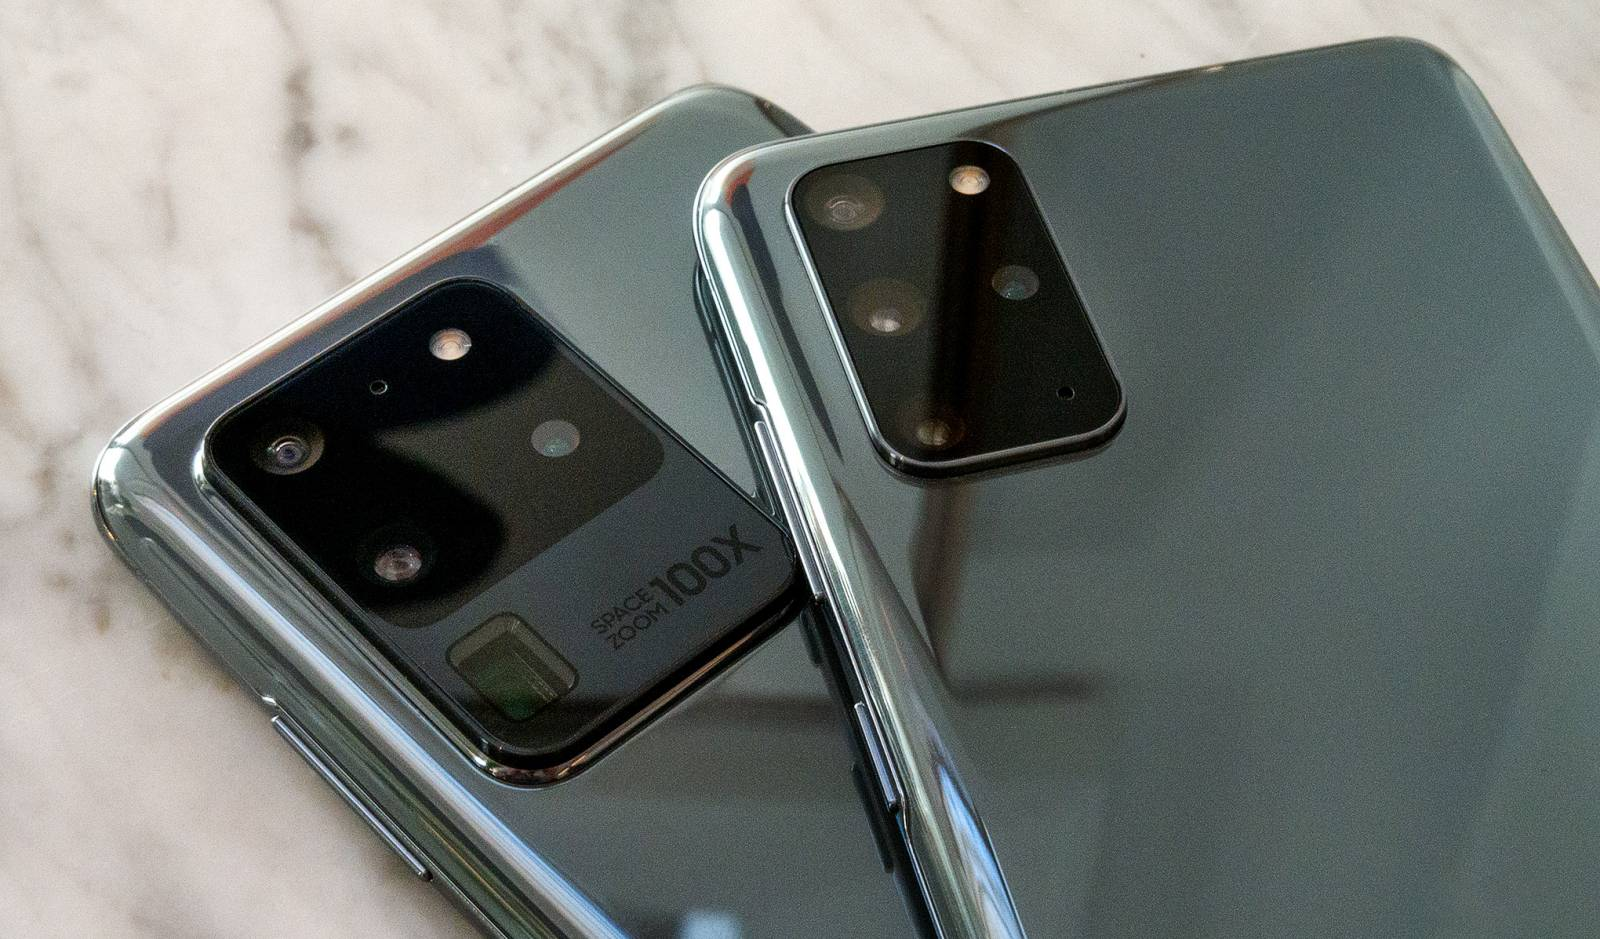 Samsung GALAXY S20 ULTRA compromis